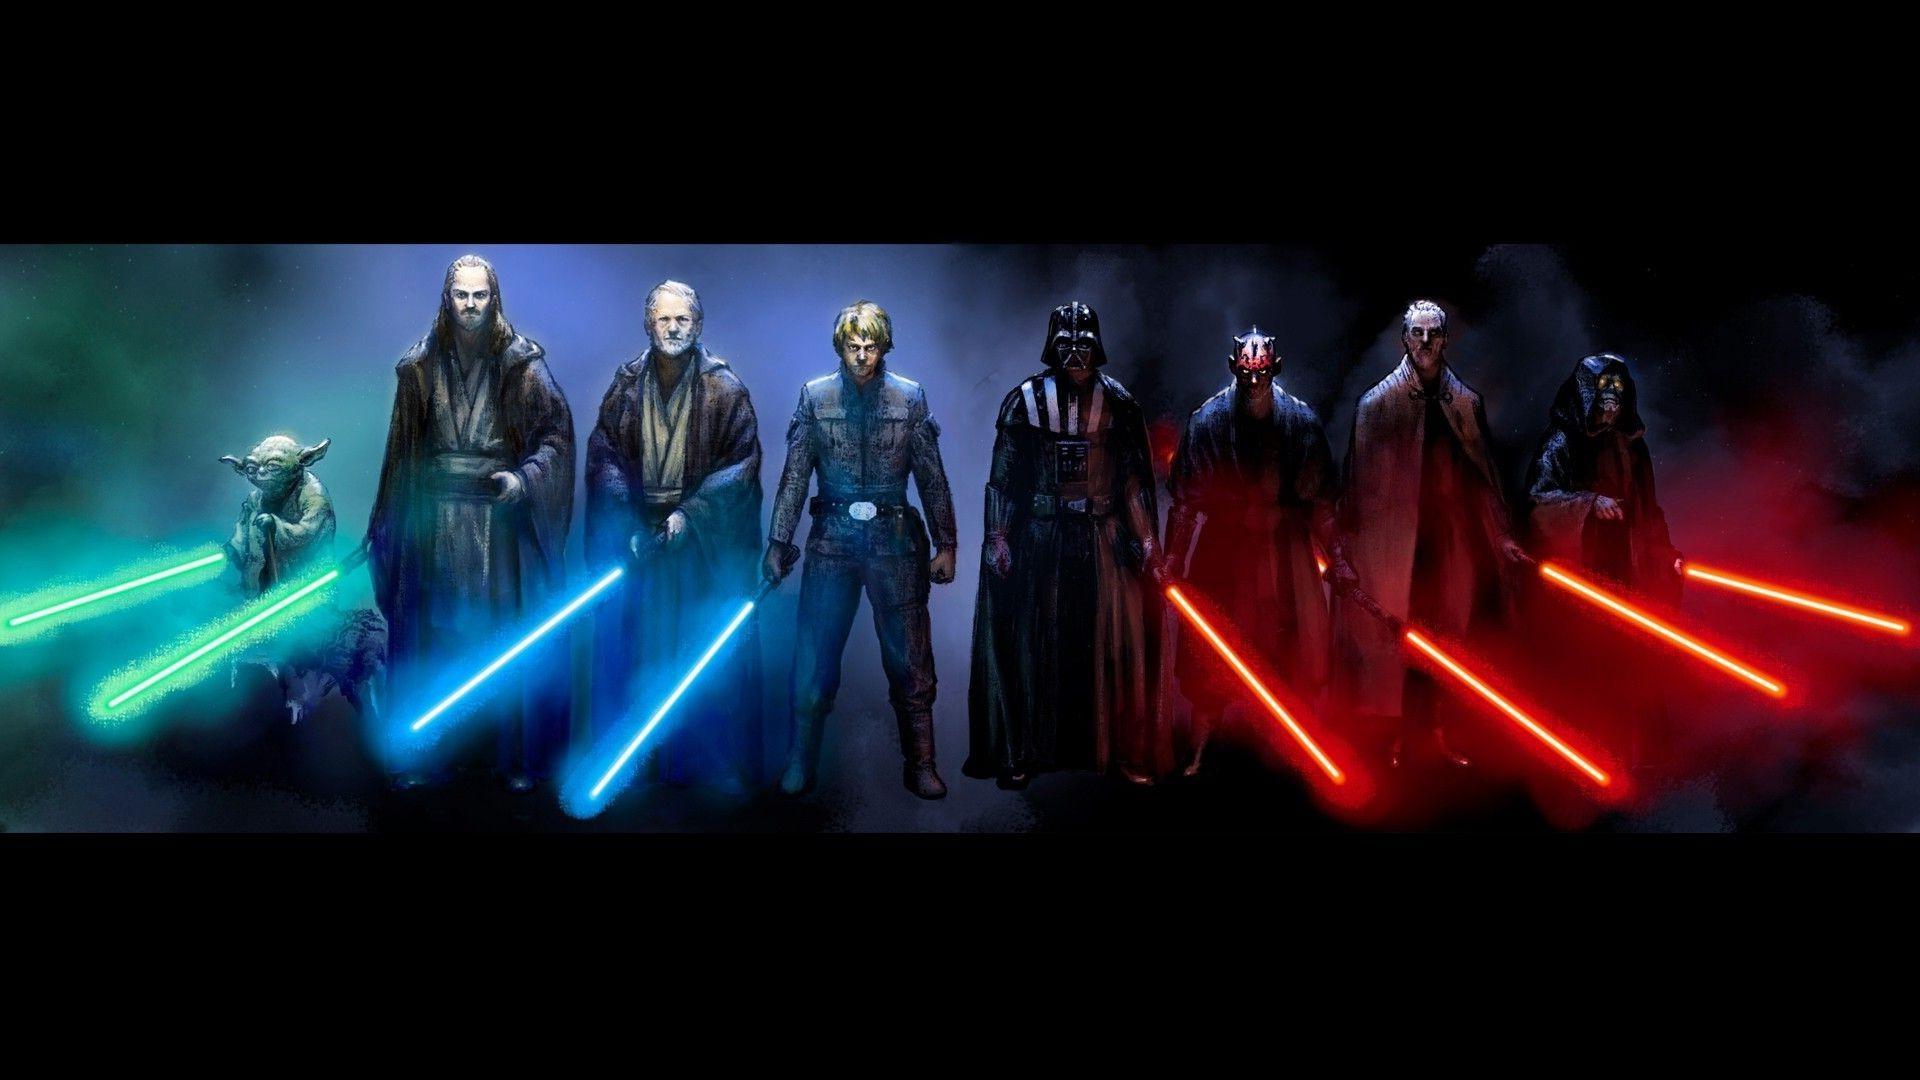 5760x1080 Star Wars Wallpaper (23+ images)